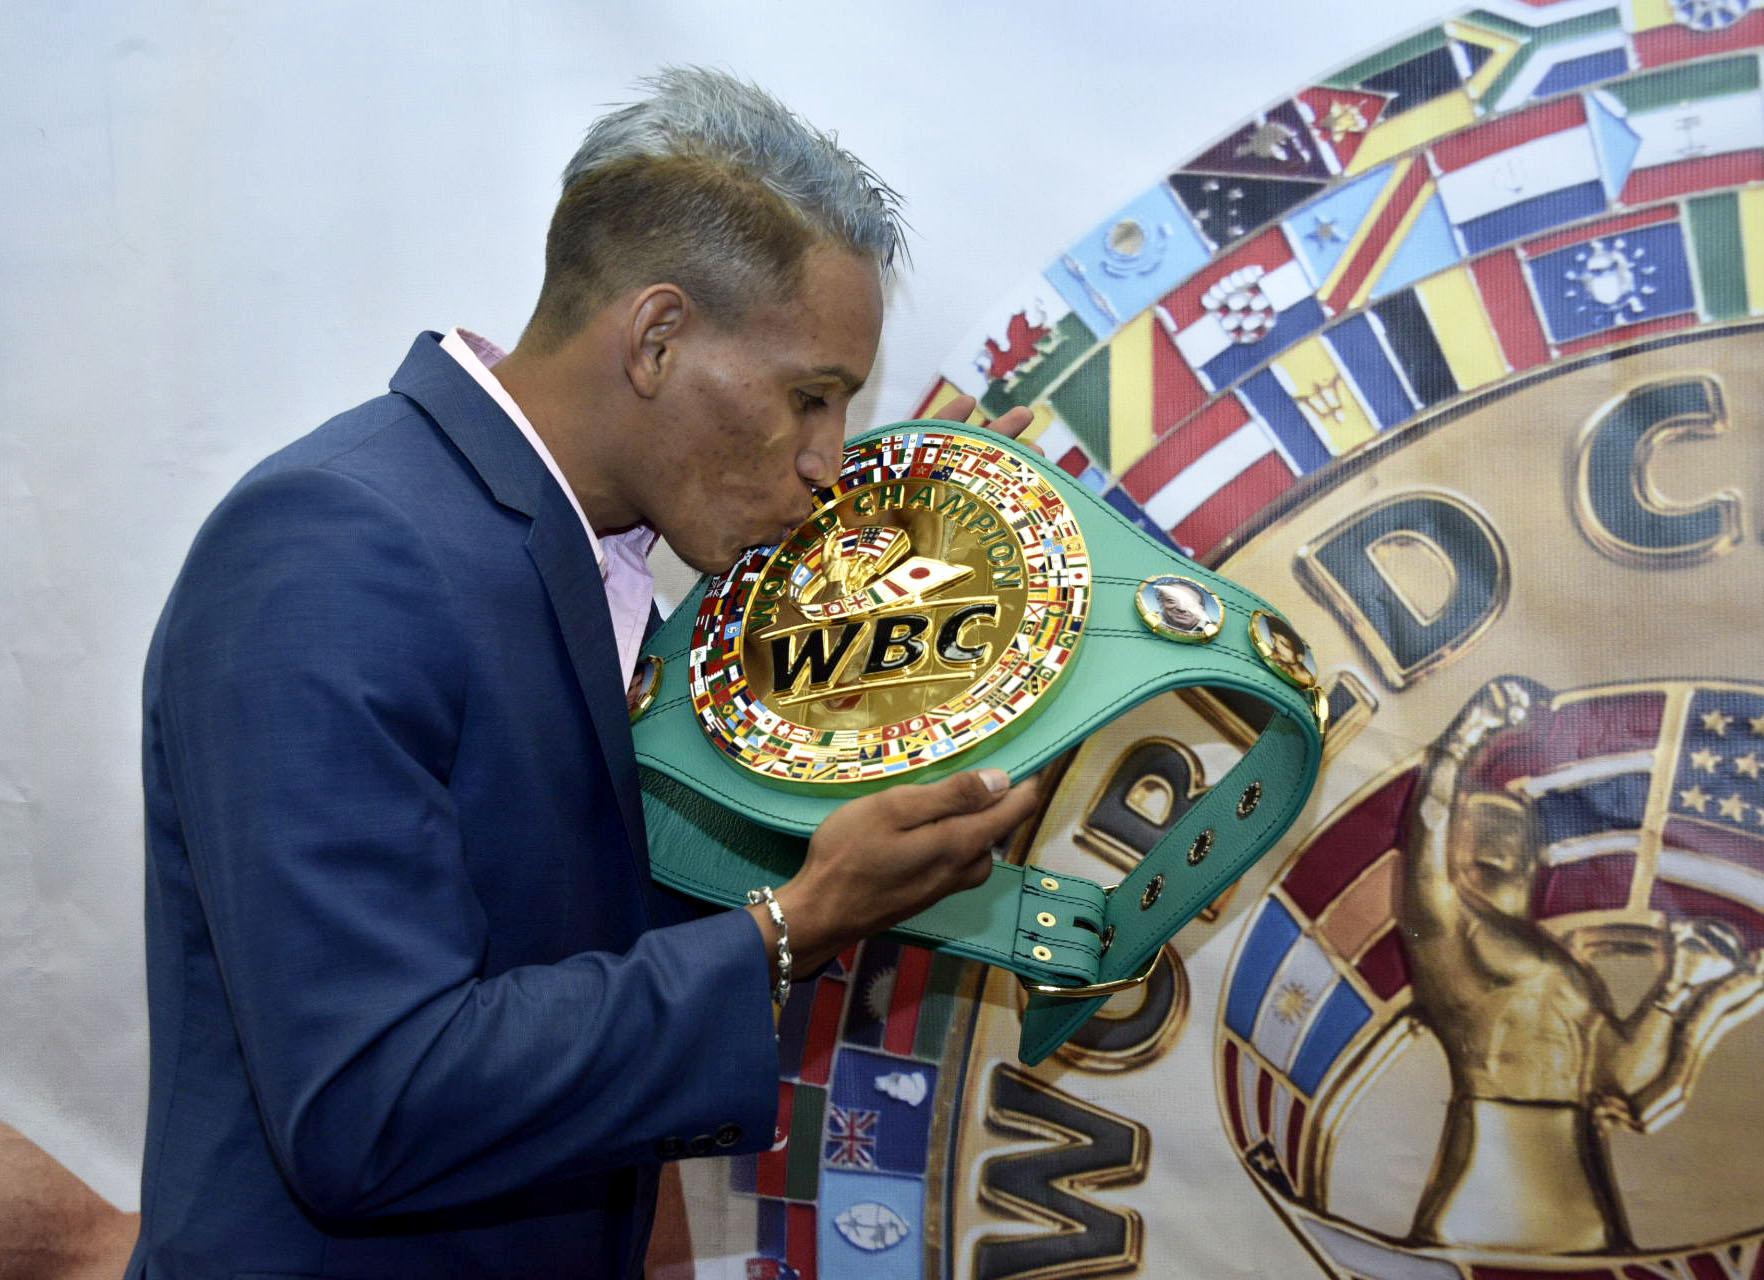 CRISTOFER ROSALES WBC